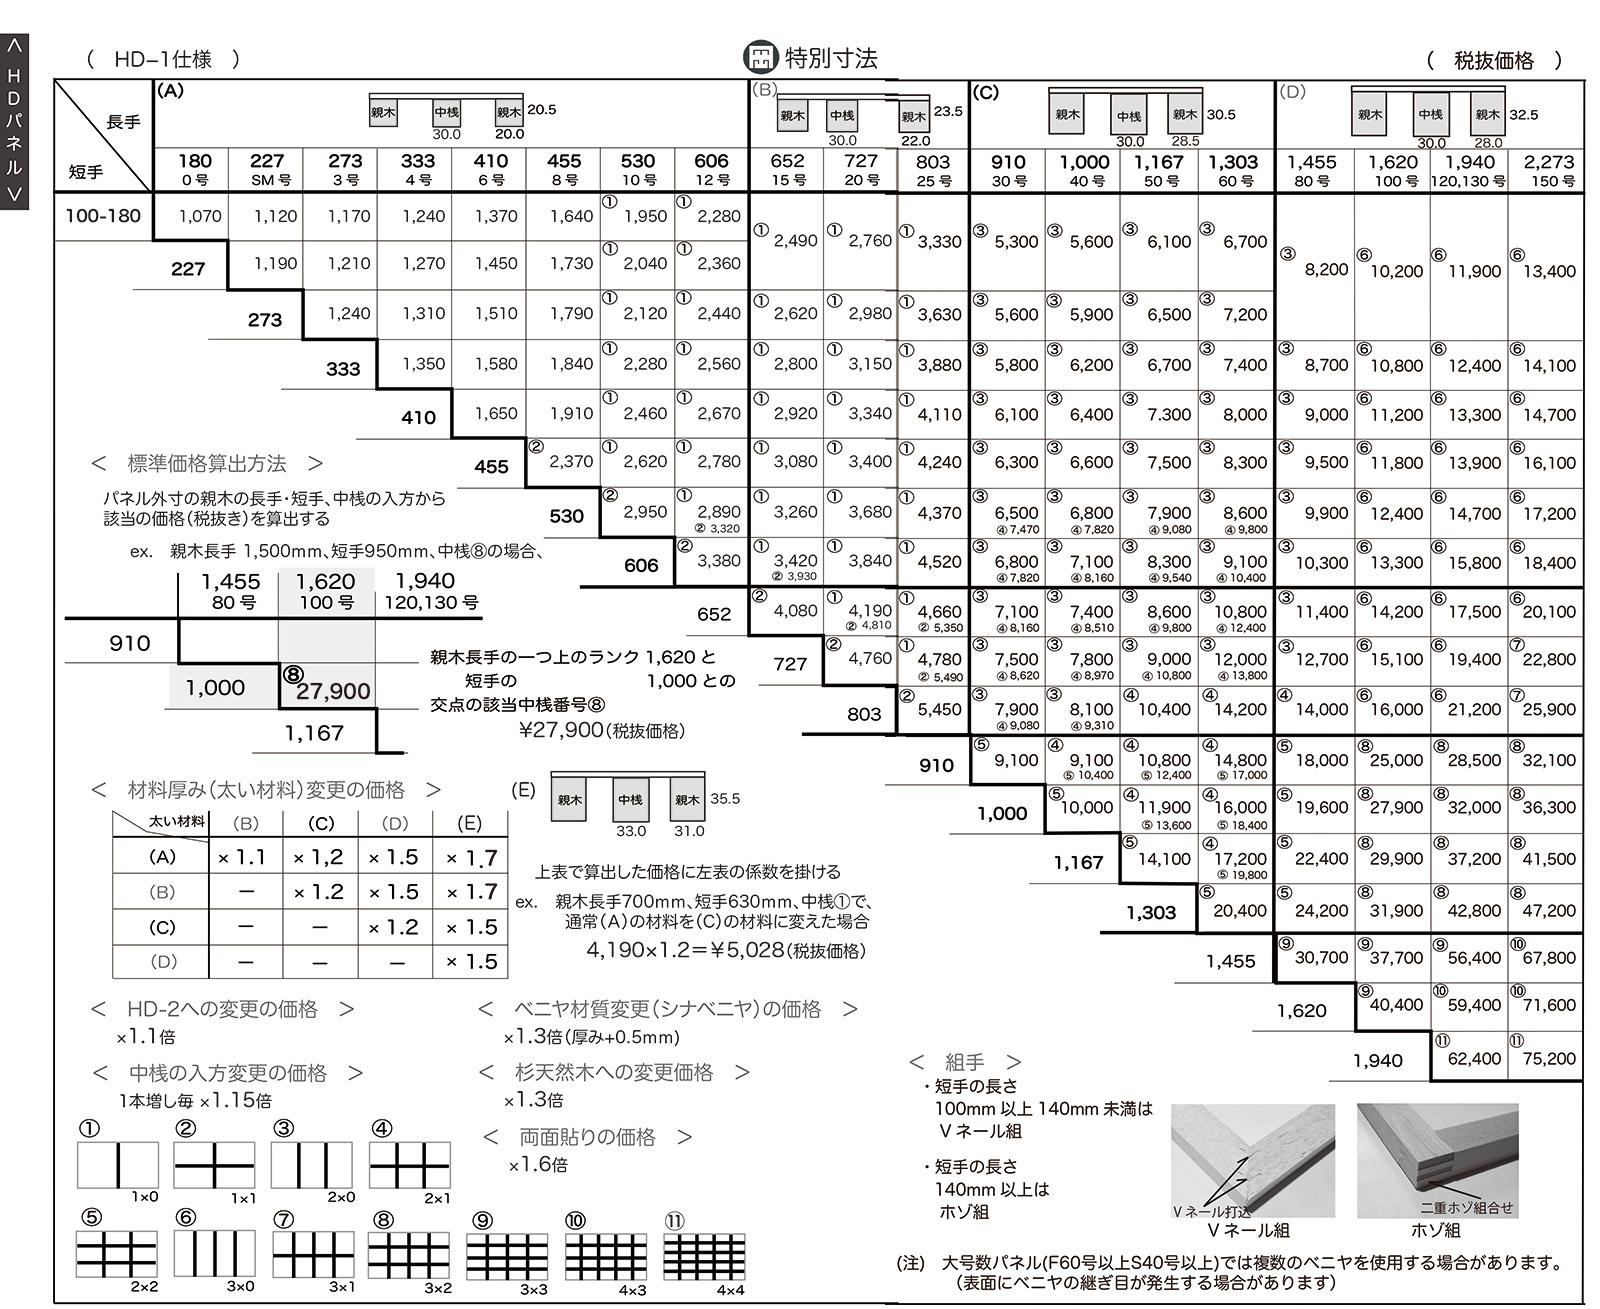 HD-1特寸サイズ表